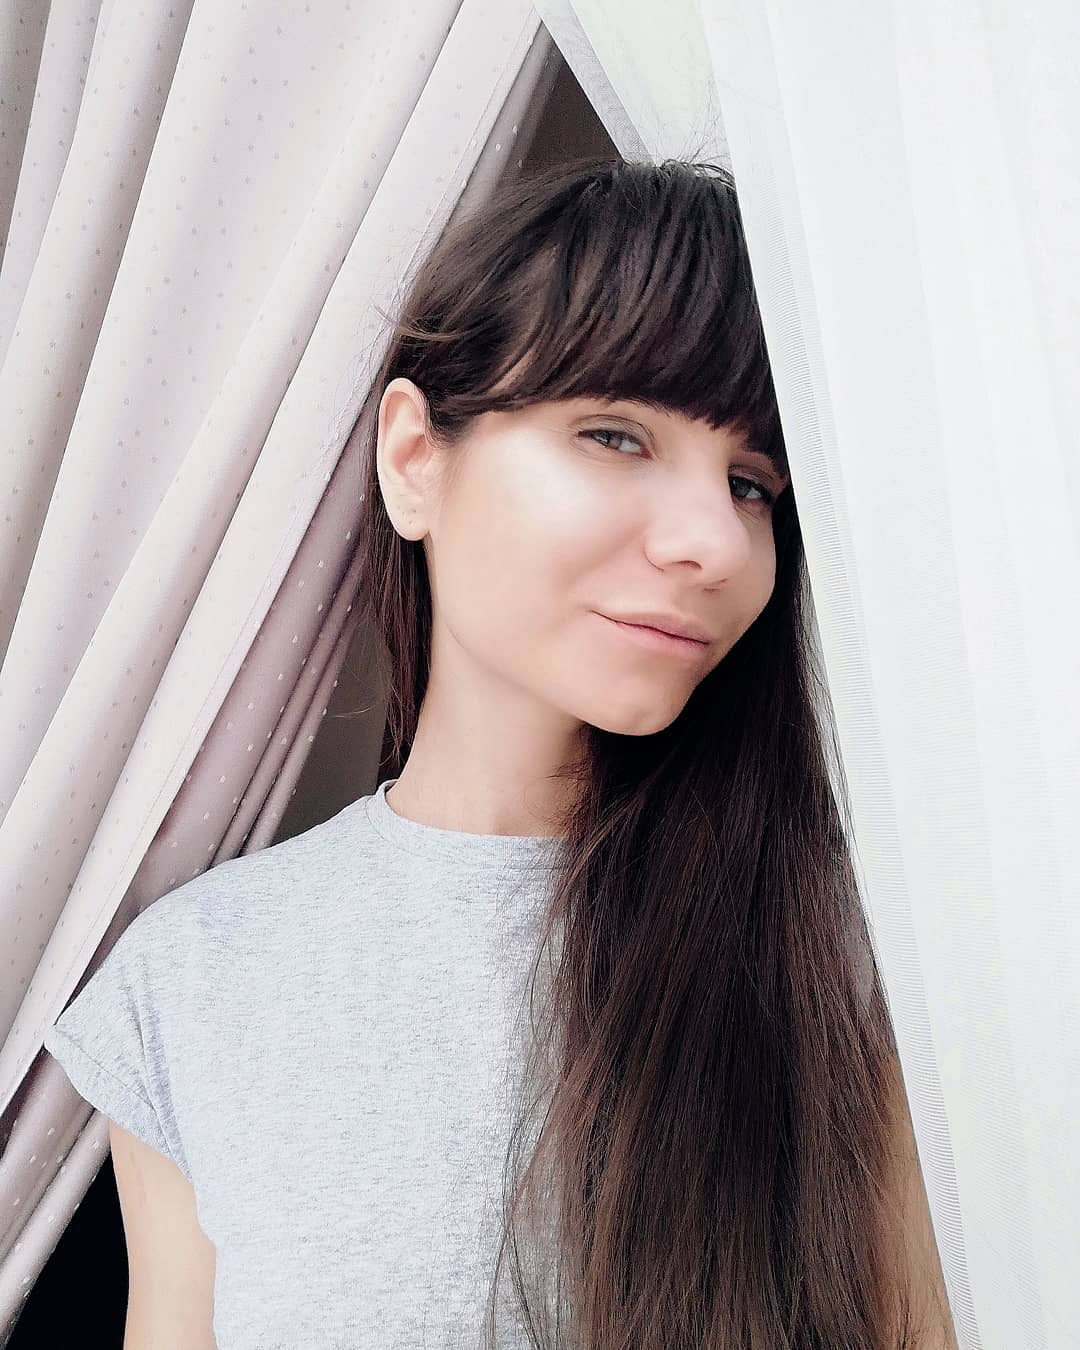 Alyona-Safronova-Wallpapers-Insta-Fit-Bio-16